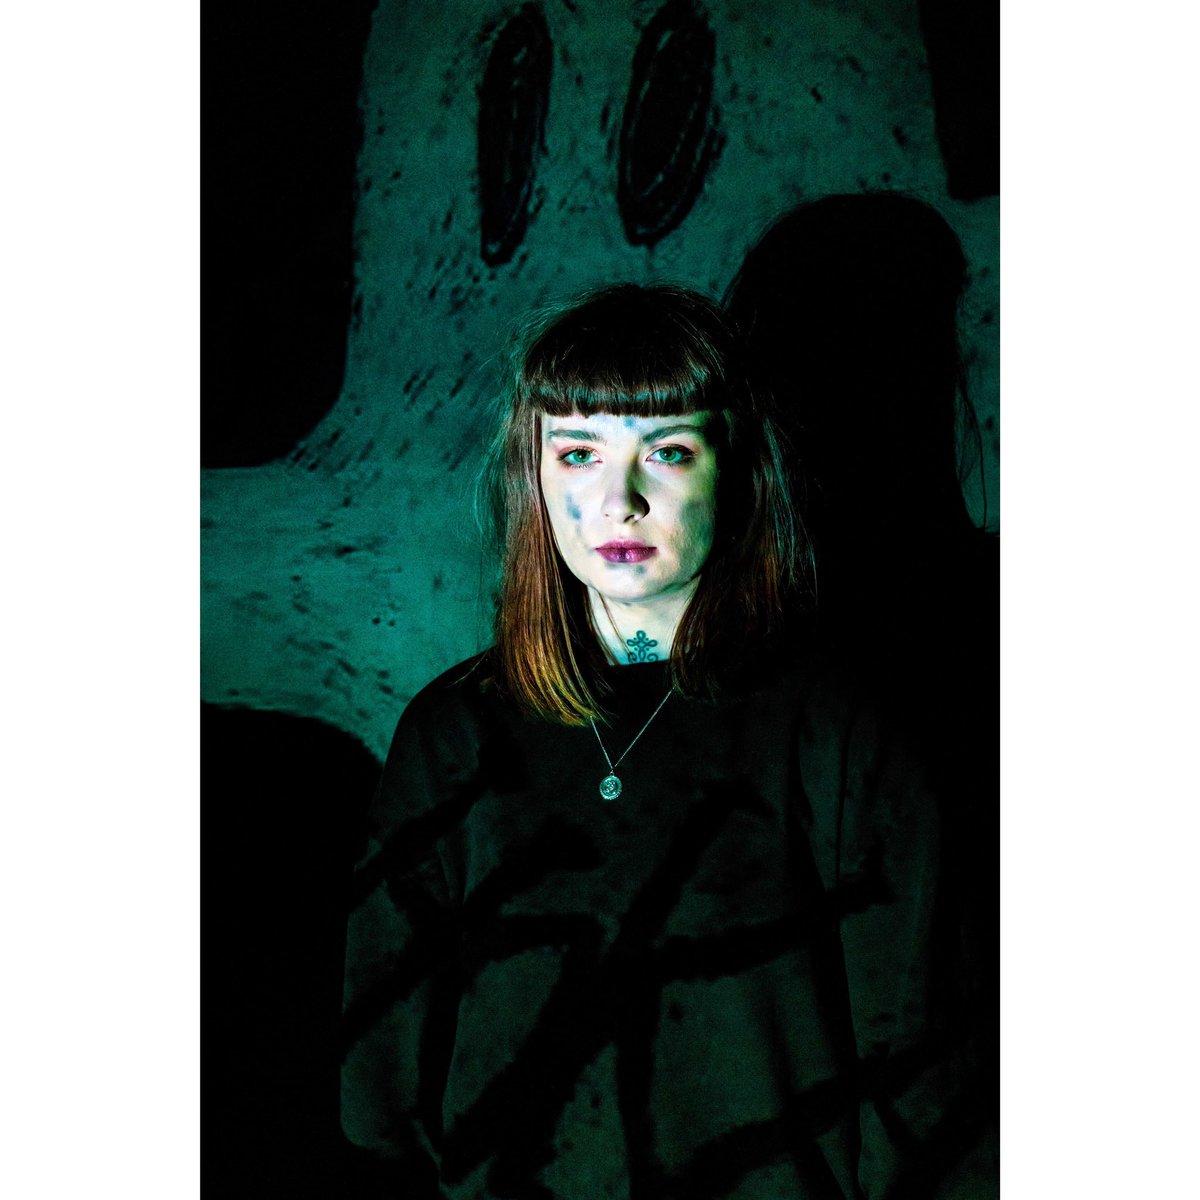 Insta @kyle_ burgess_photography  #music #musician #musicphotography #drummer #drummergirl #studiophotography #sonya7r #portraitphotography #portrait #musicpromotion #doommetalpic.twitter.com/FagaEmbZOH